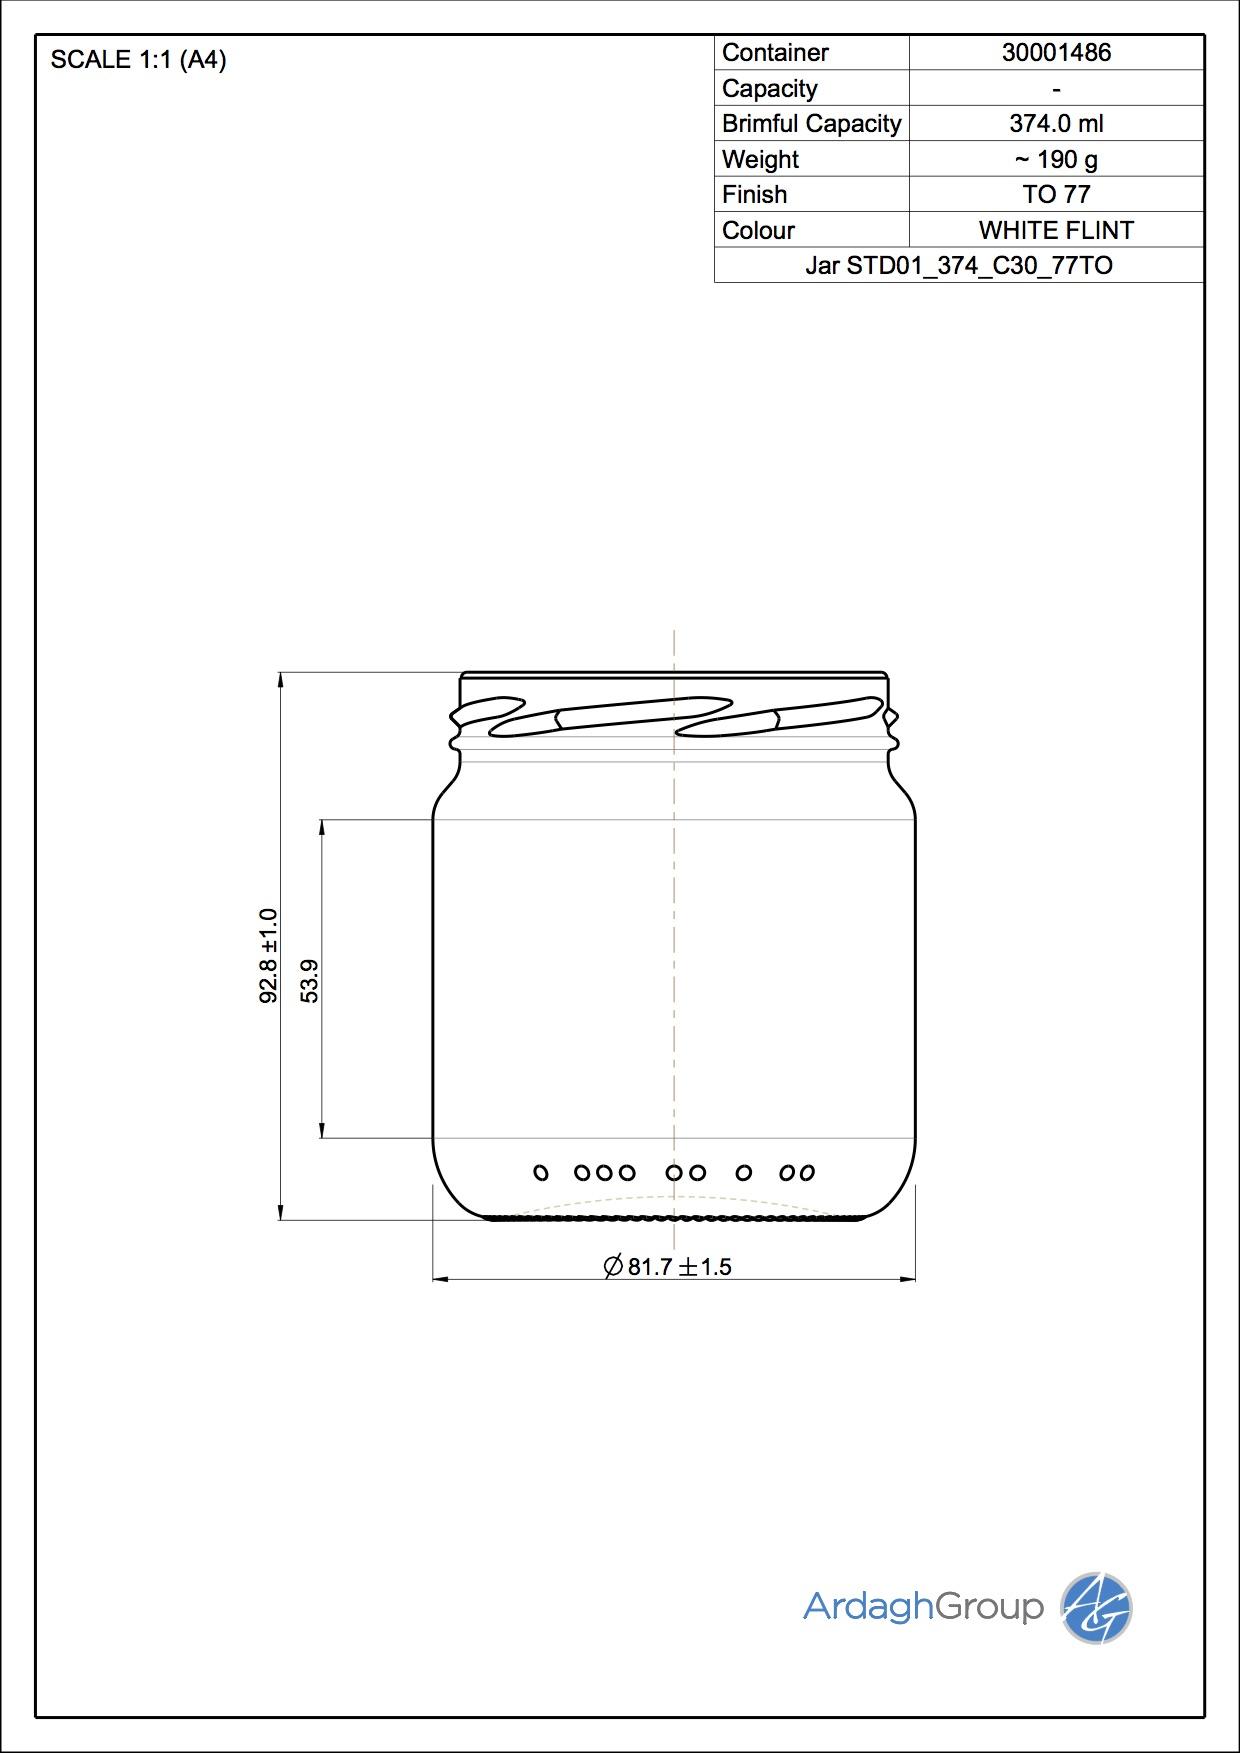 Jar STD01_374_C30_77TO